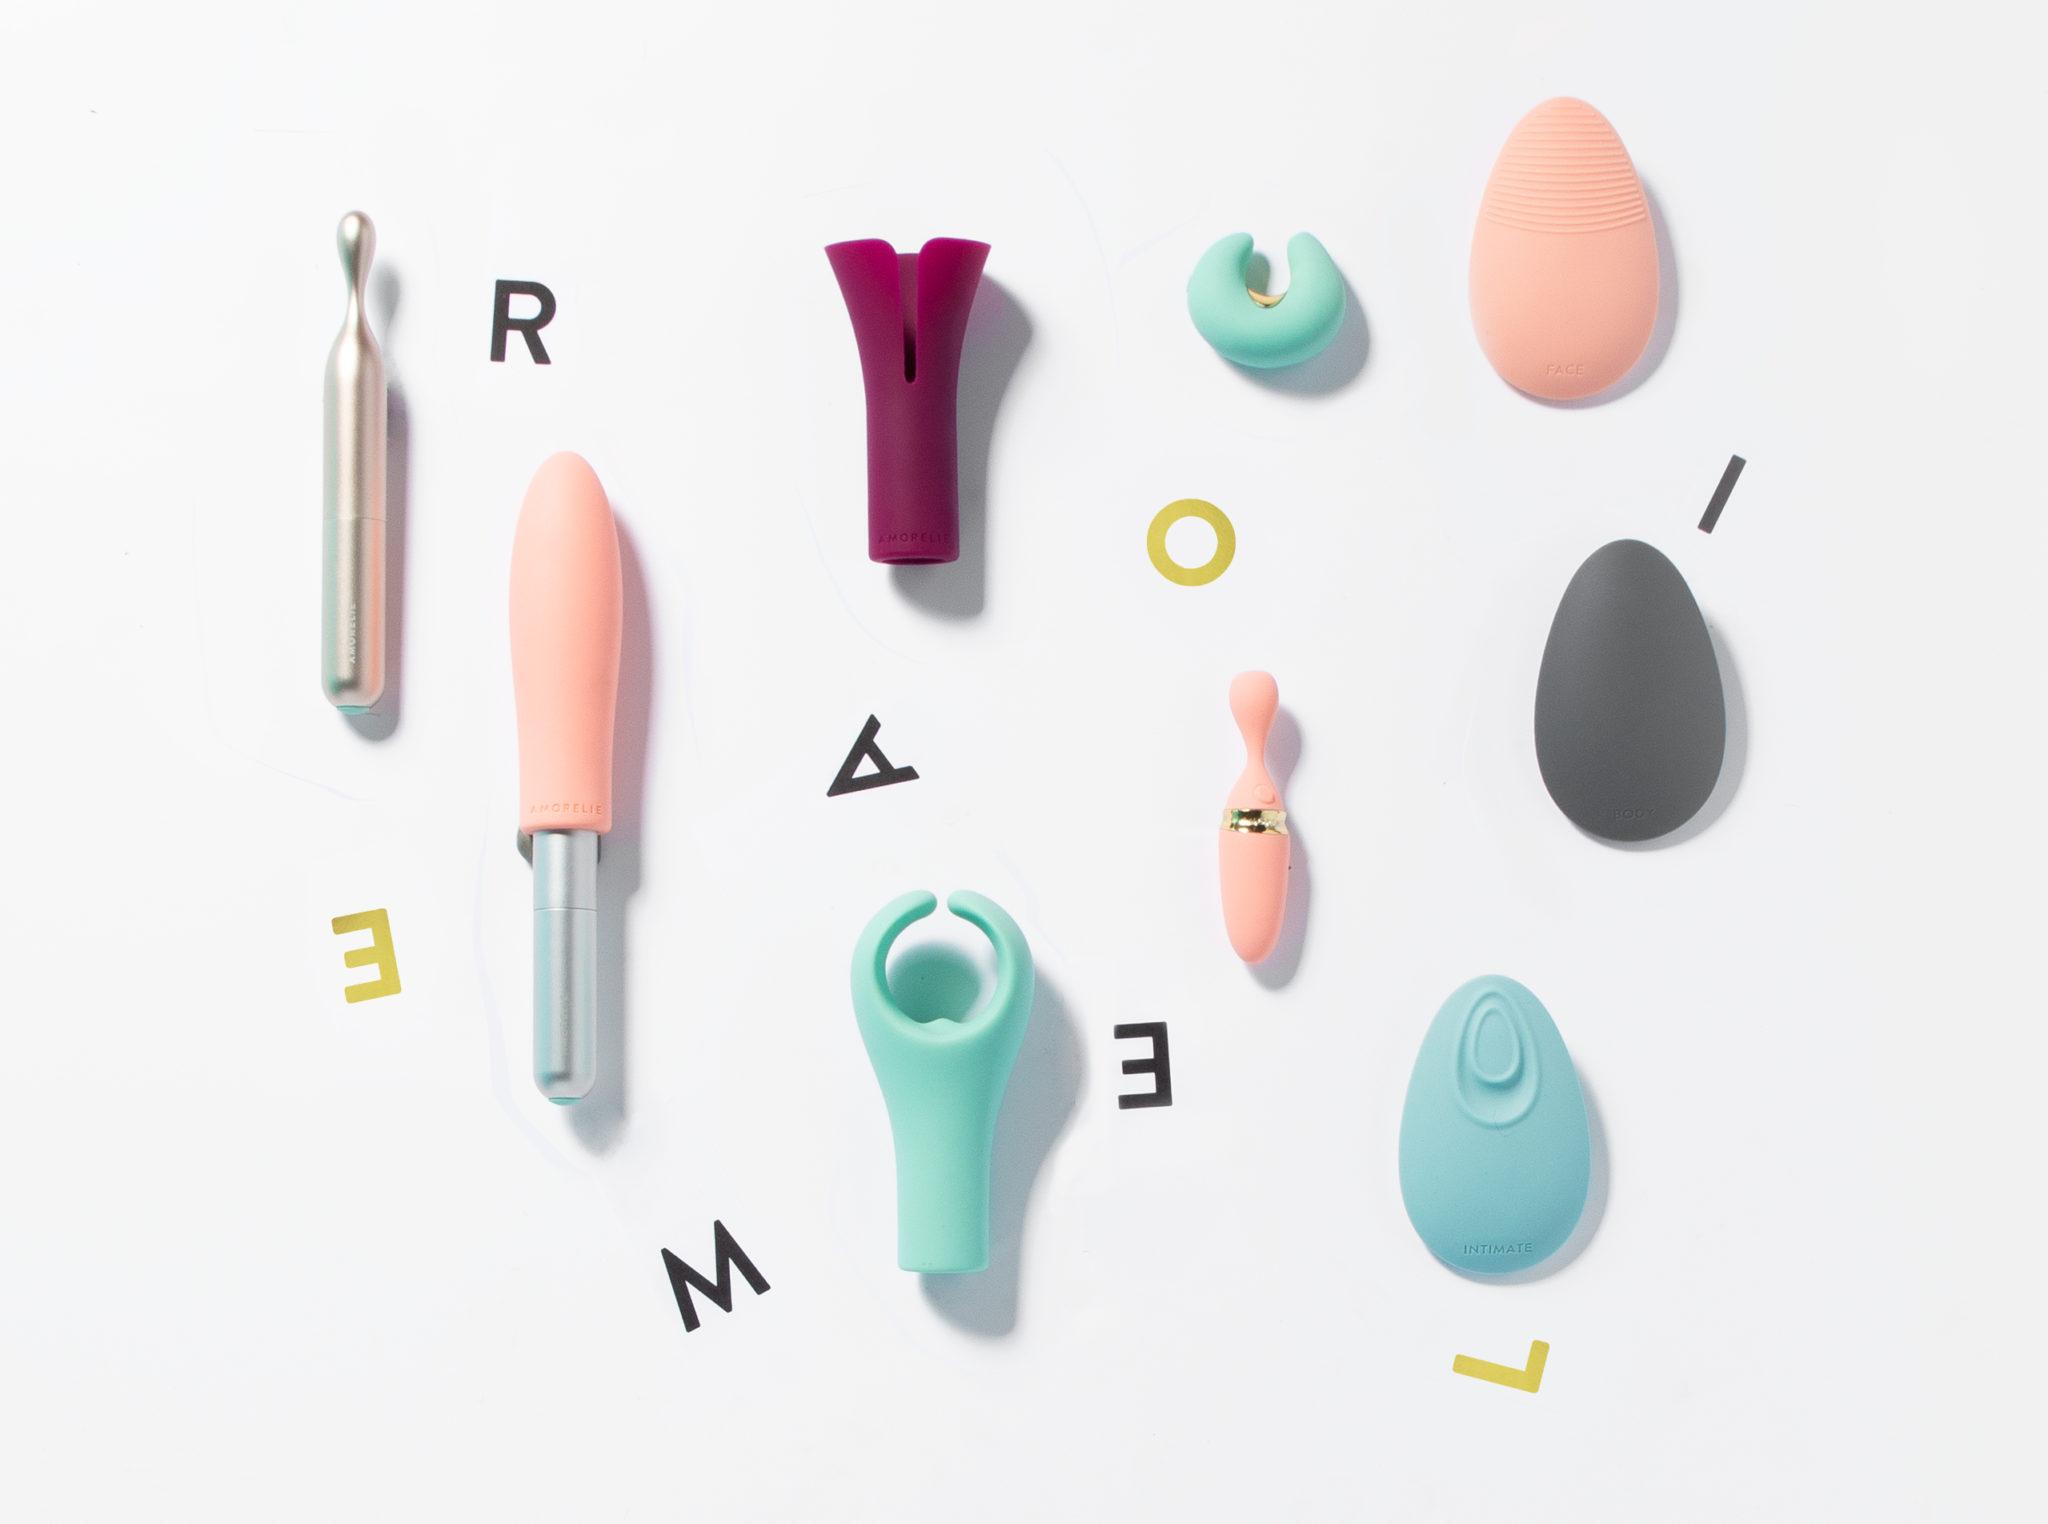 AMORELIE Toys sexe toys masturbation femmes se masturbent autant hommes